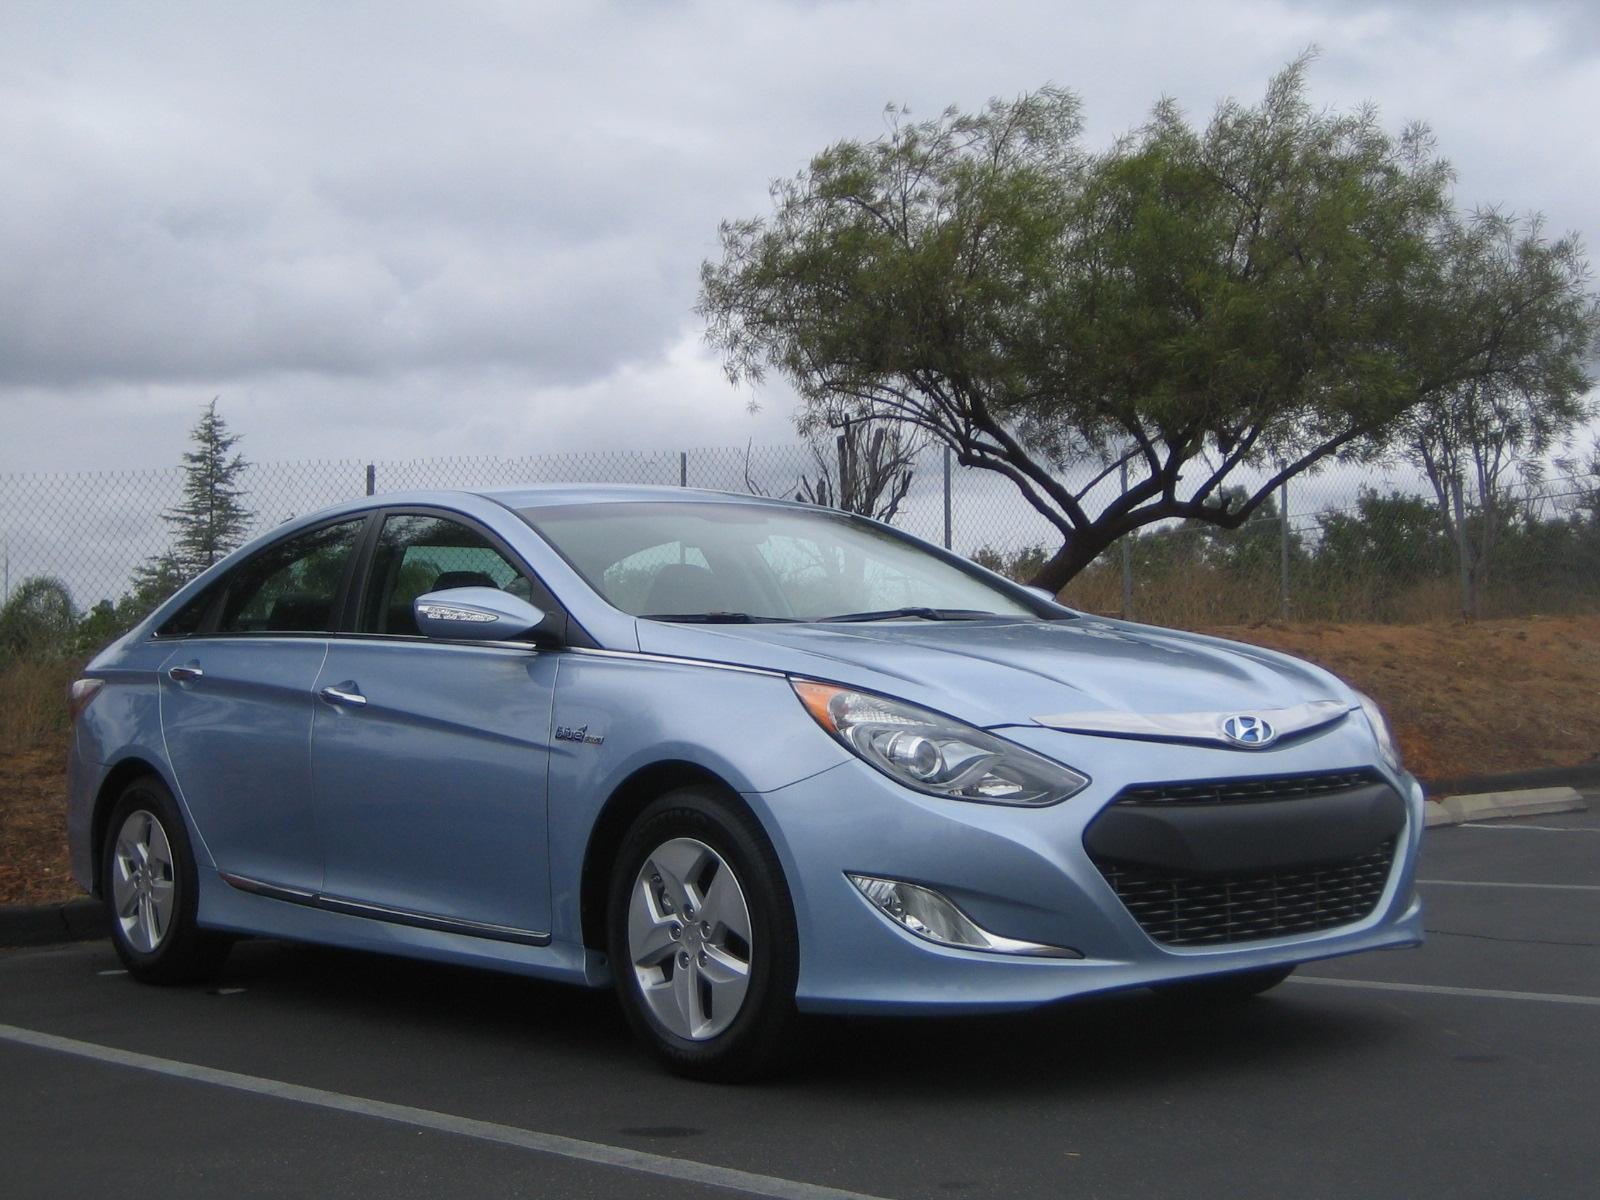 2011 Hyundai Sonata Hybrid Delayed A Month  Misses Tax Credit